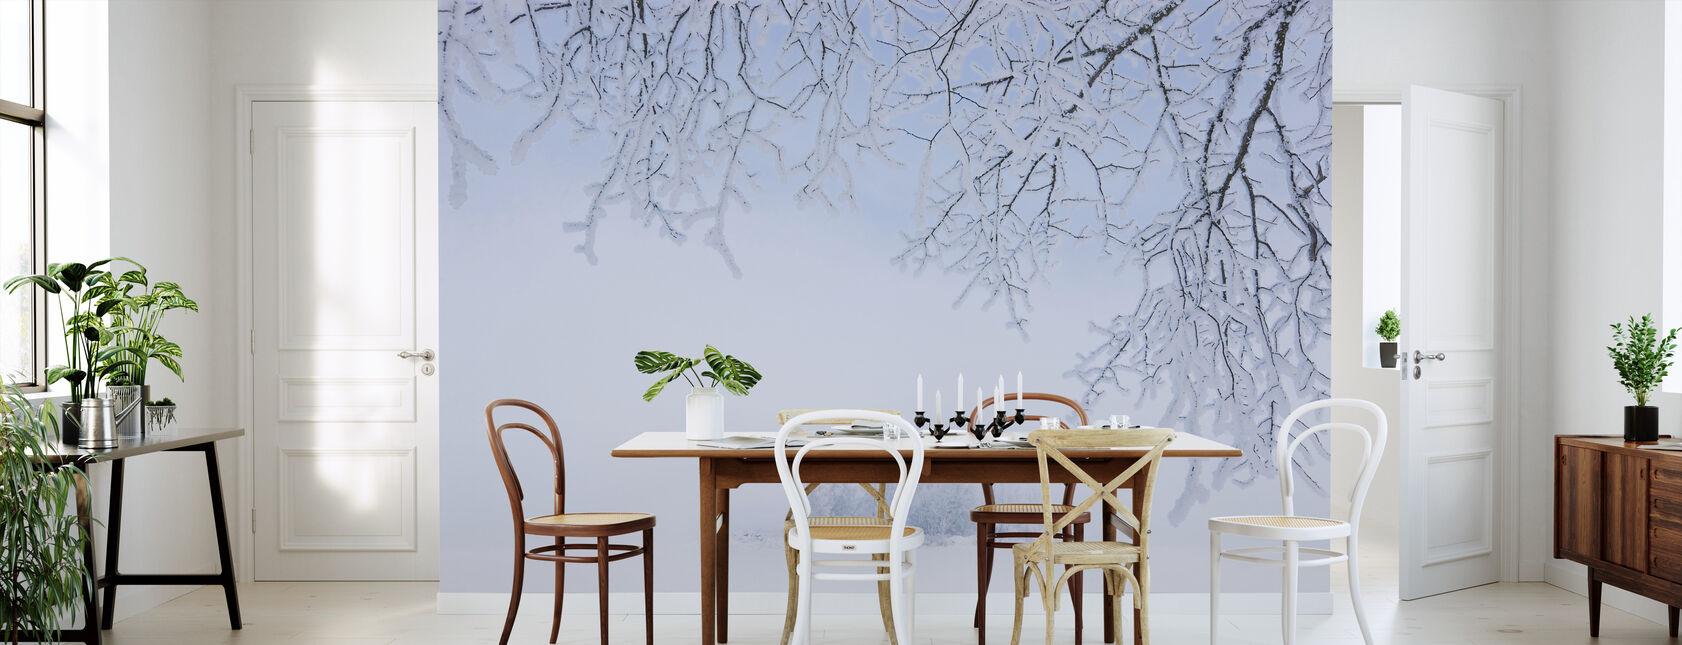 Mistige winter - Behang - Keuken